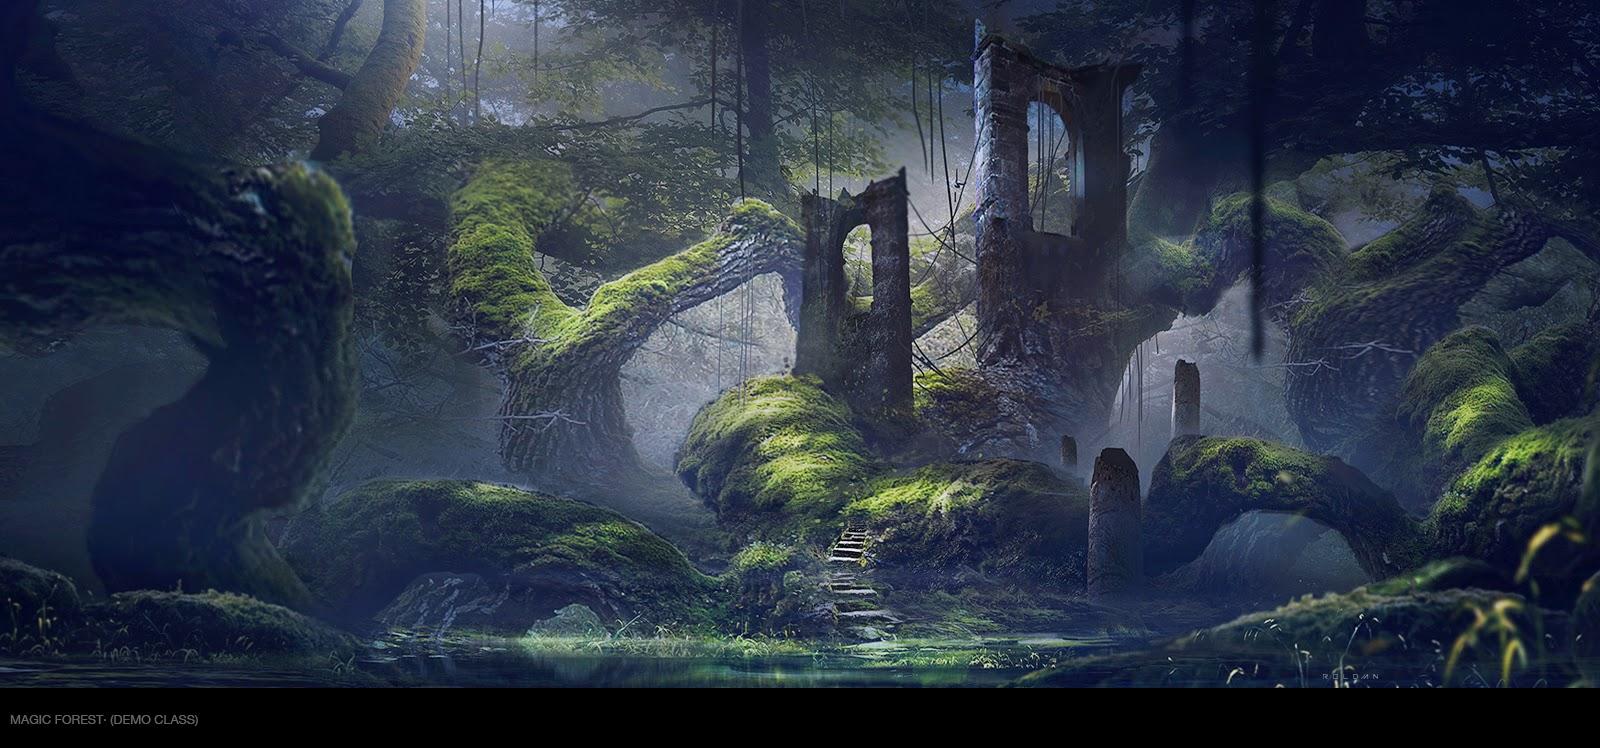 Forest Wallpaper Hd Juan Pablo Rold 193 N